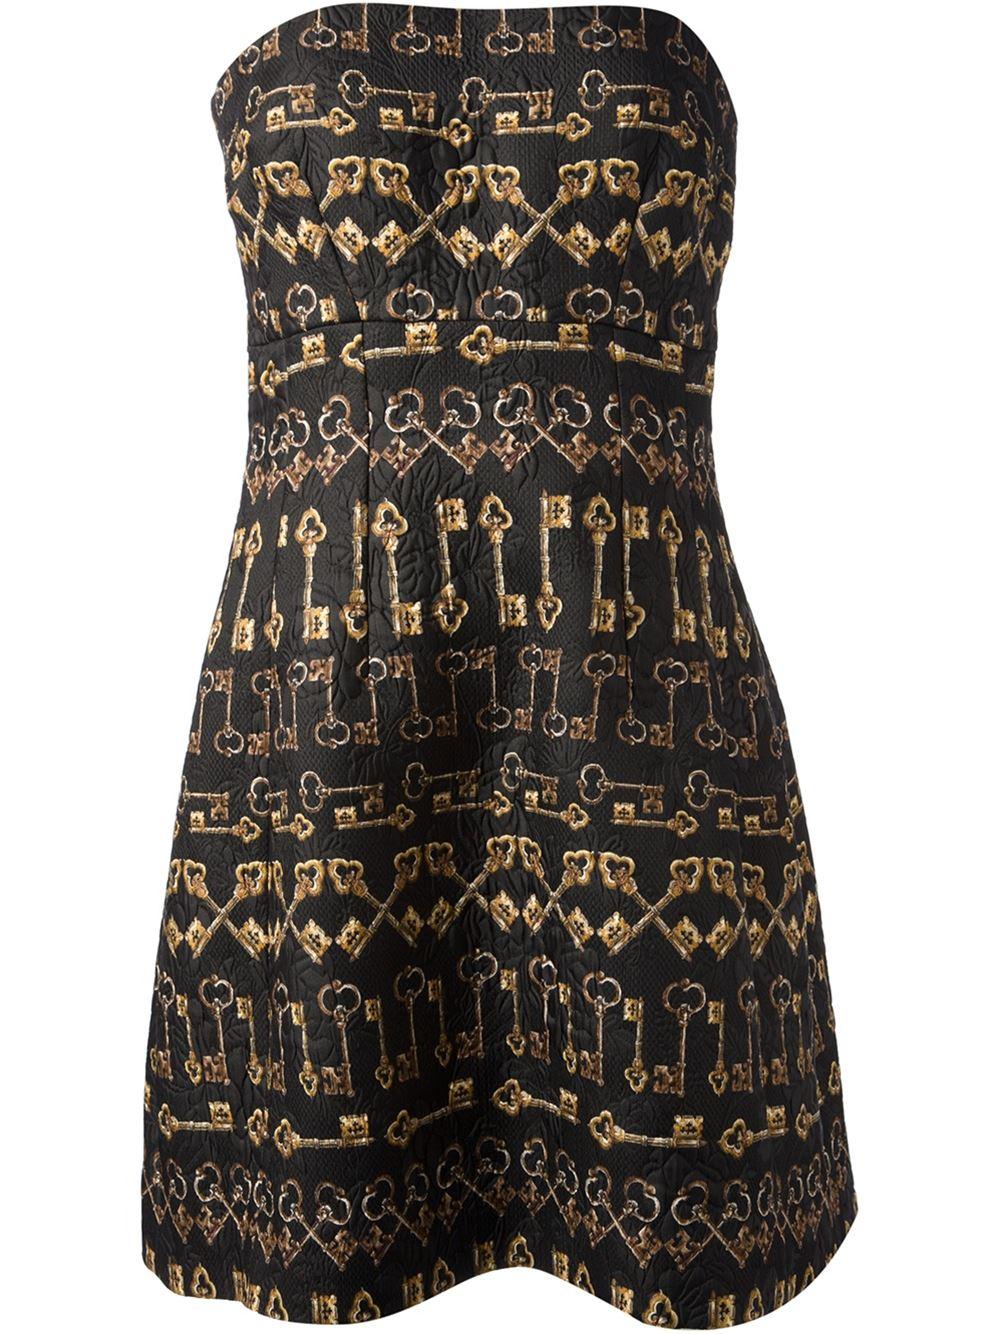 Dolce & gabbana strapless quilted dress